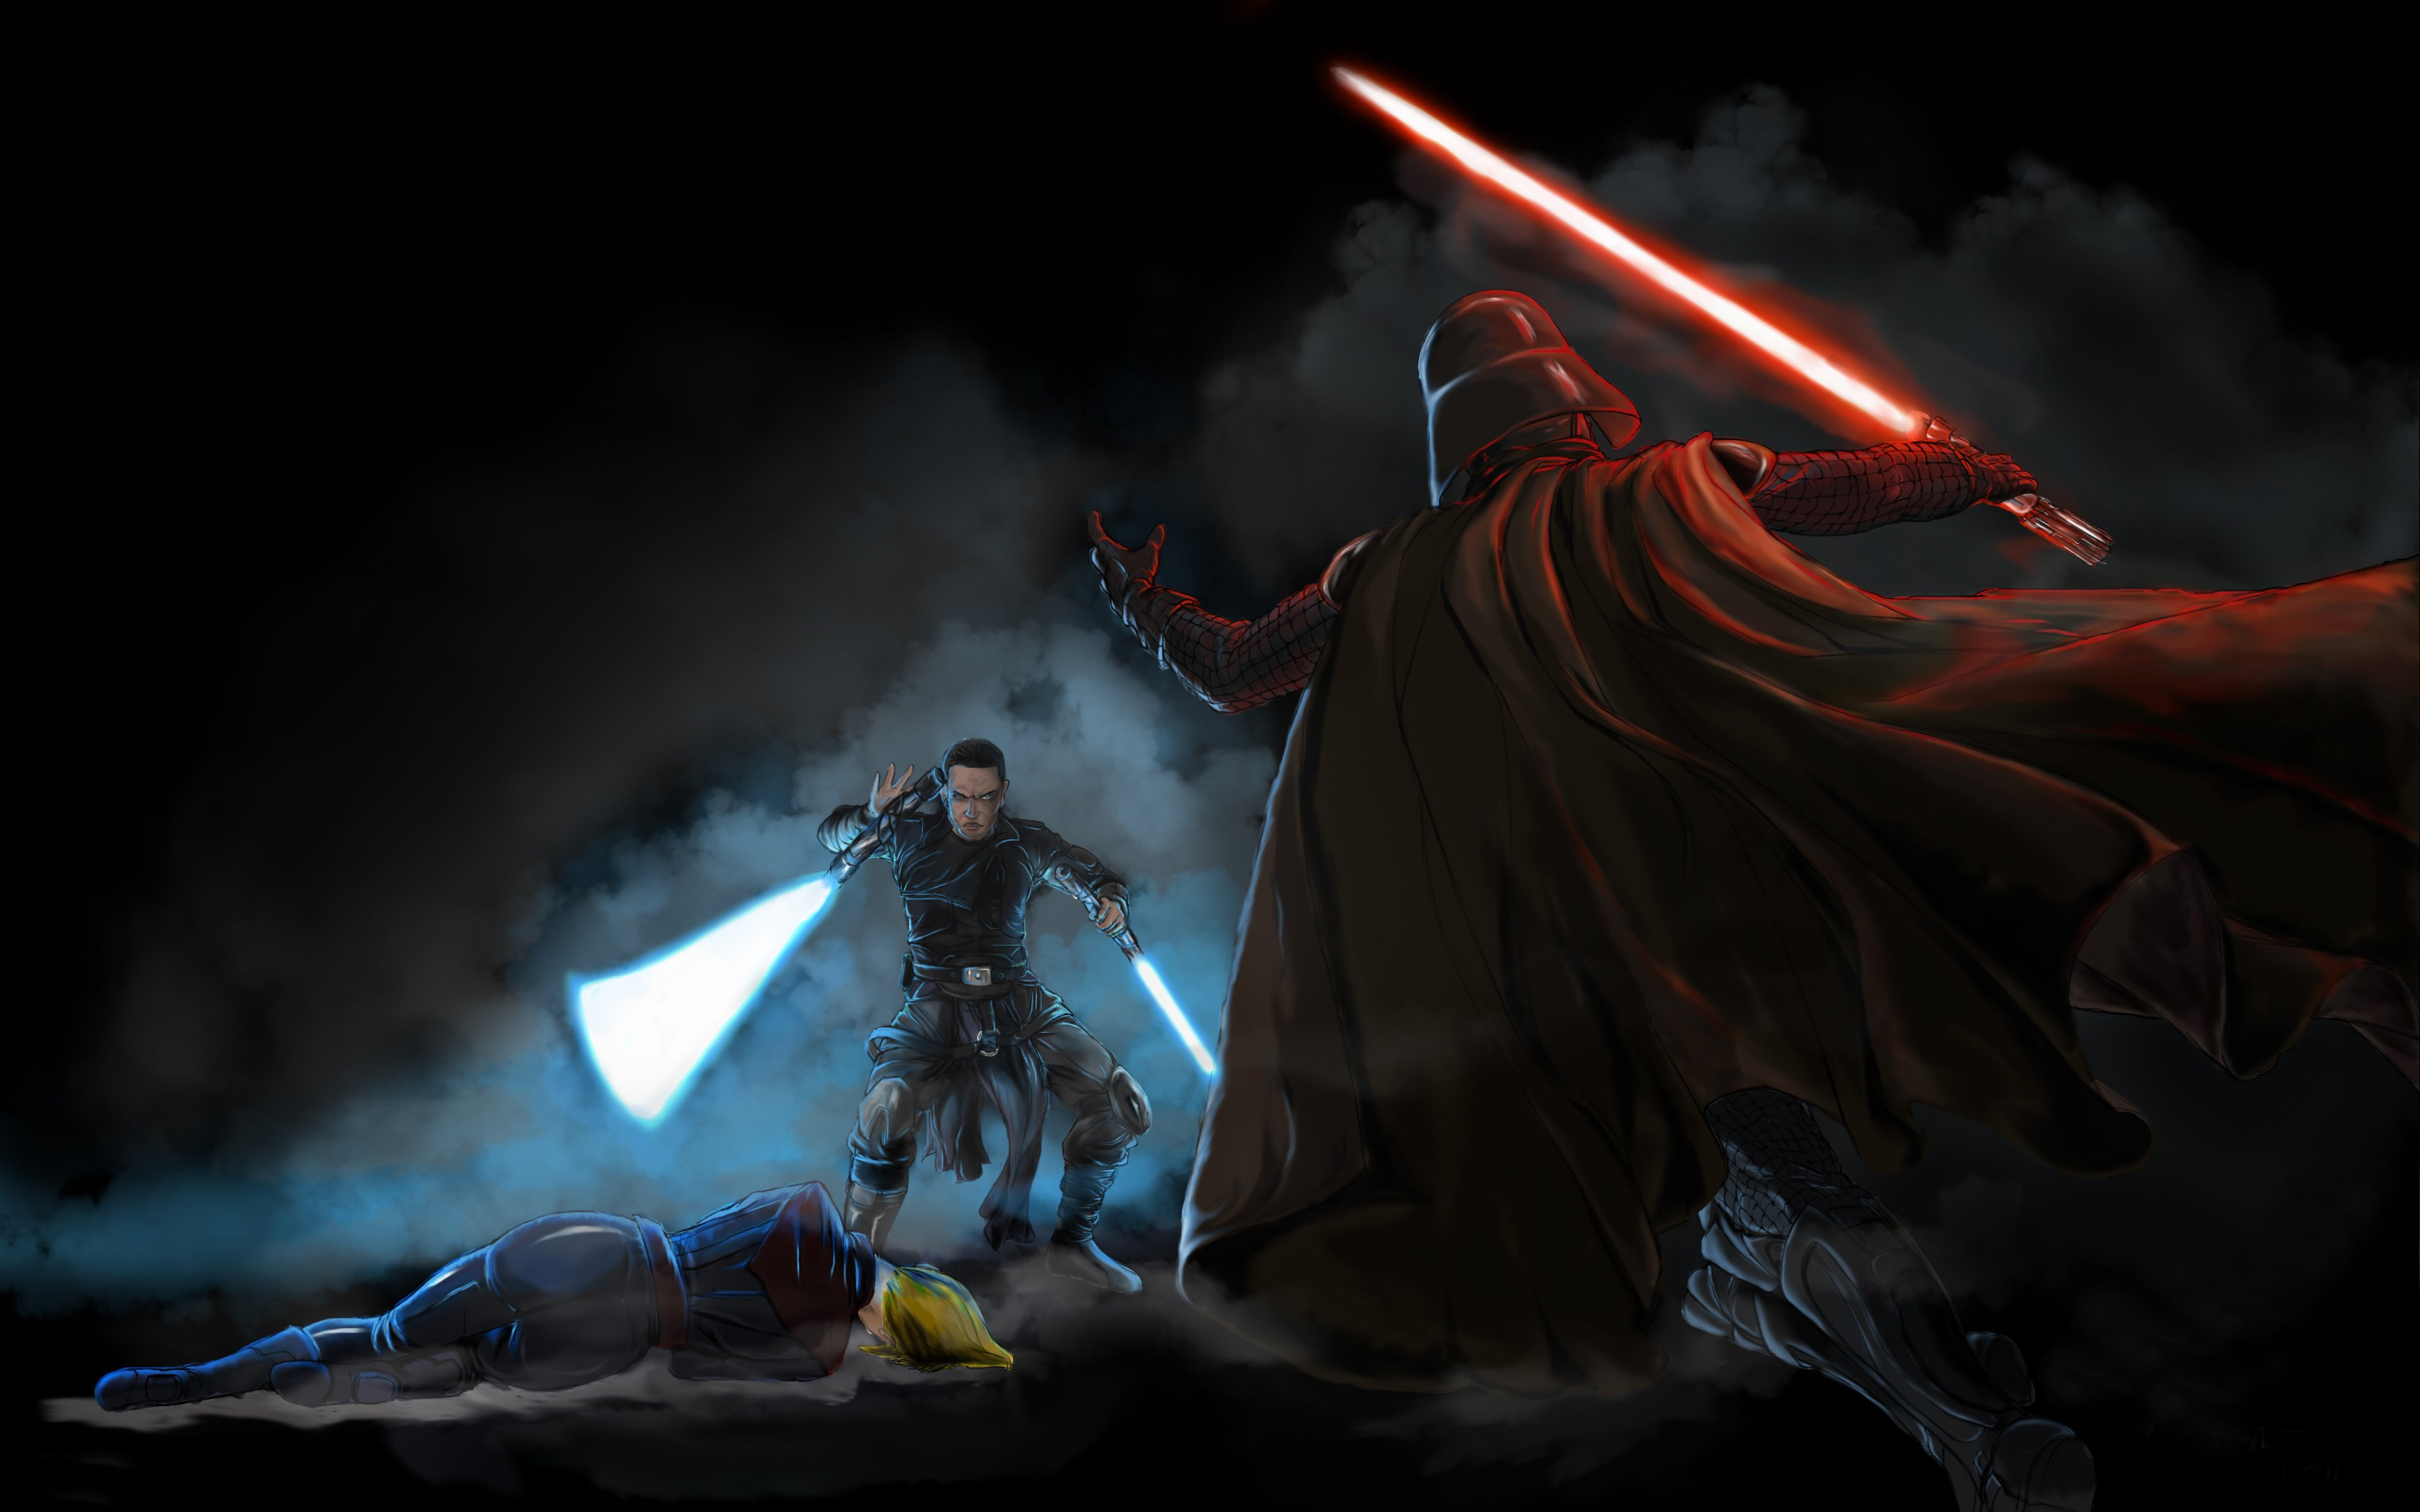 Star Wars Artwork Darth Vader Wallpapers Hd Desktop